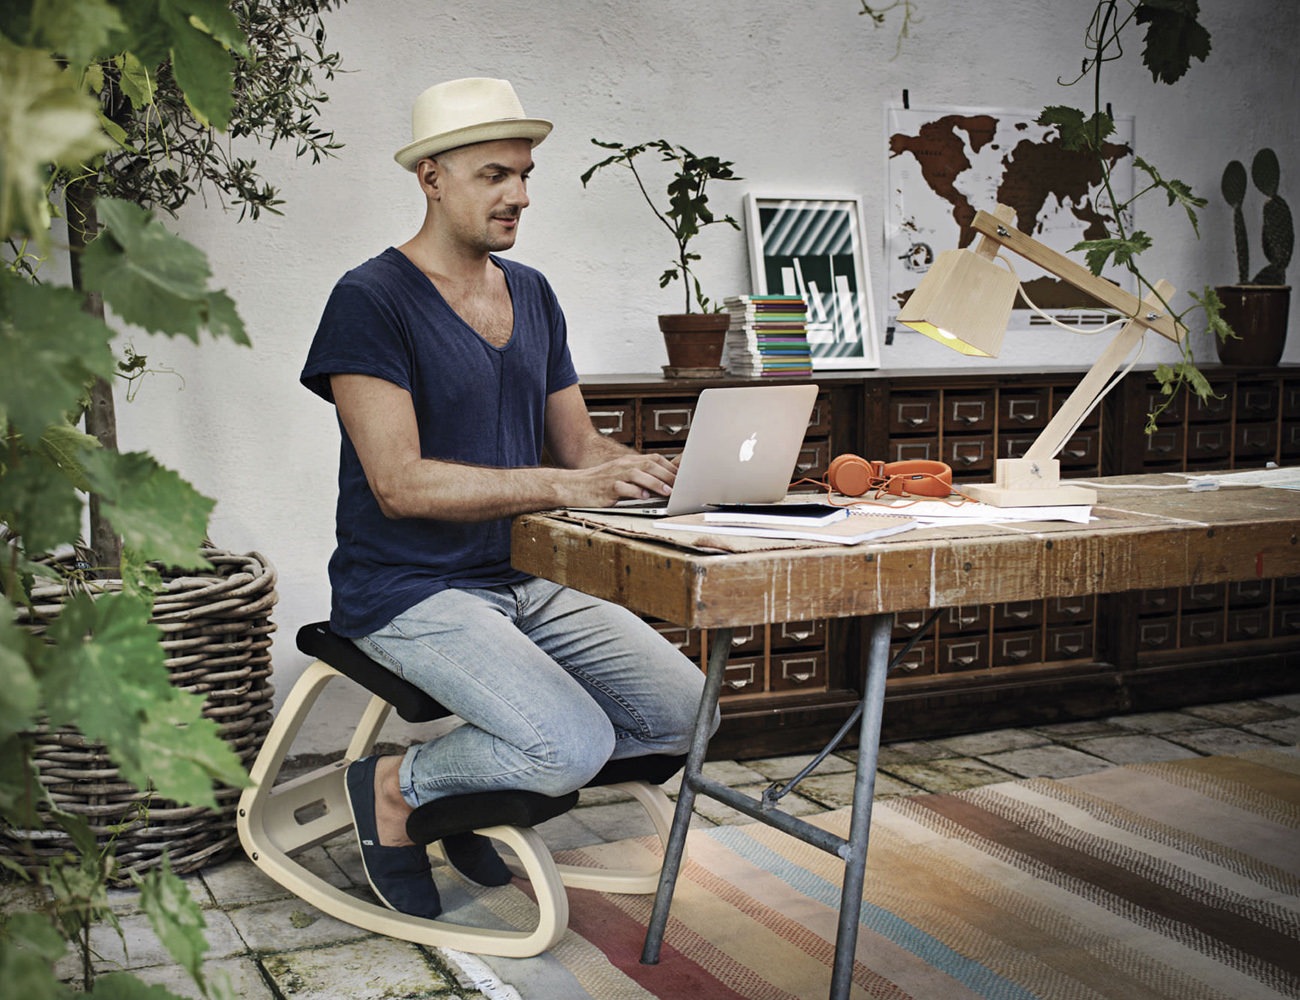 variable_balans_ergonomic_desk_chair_01